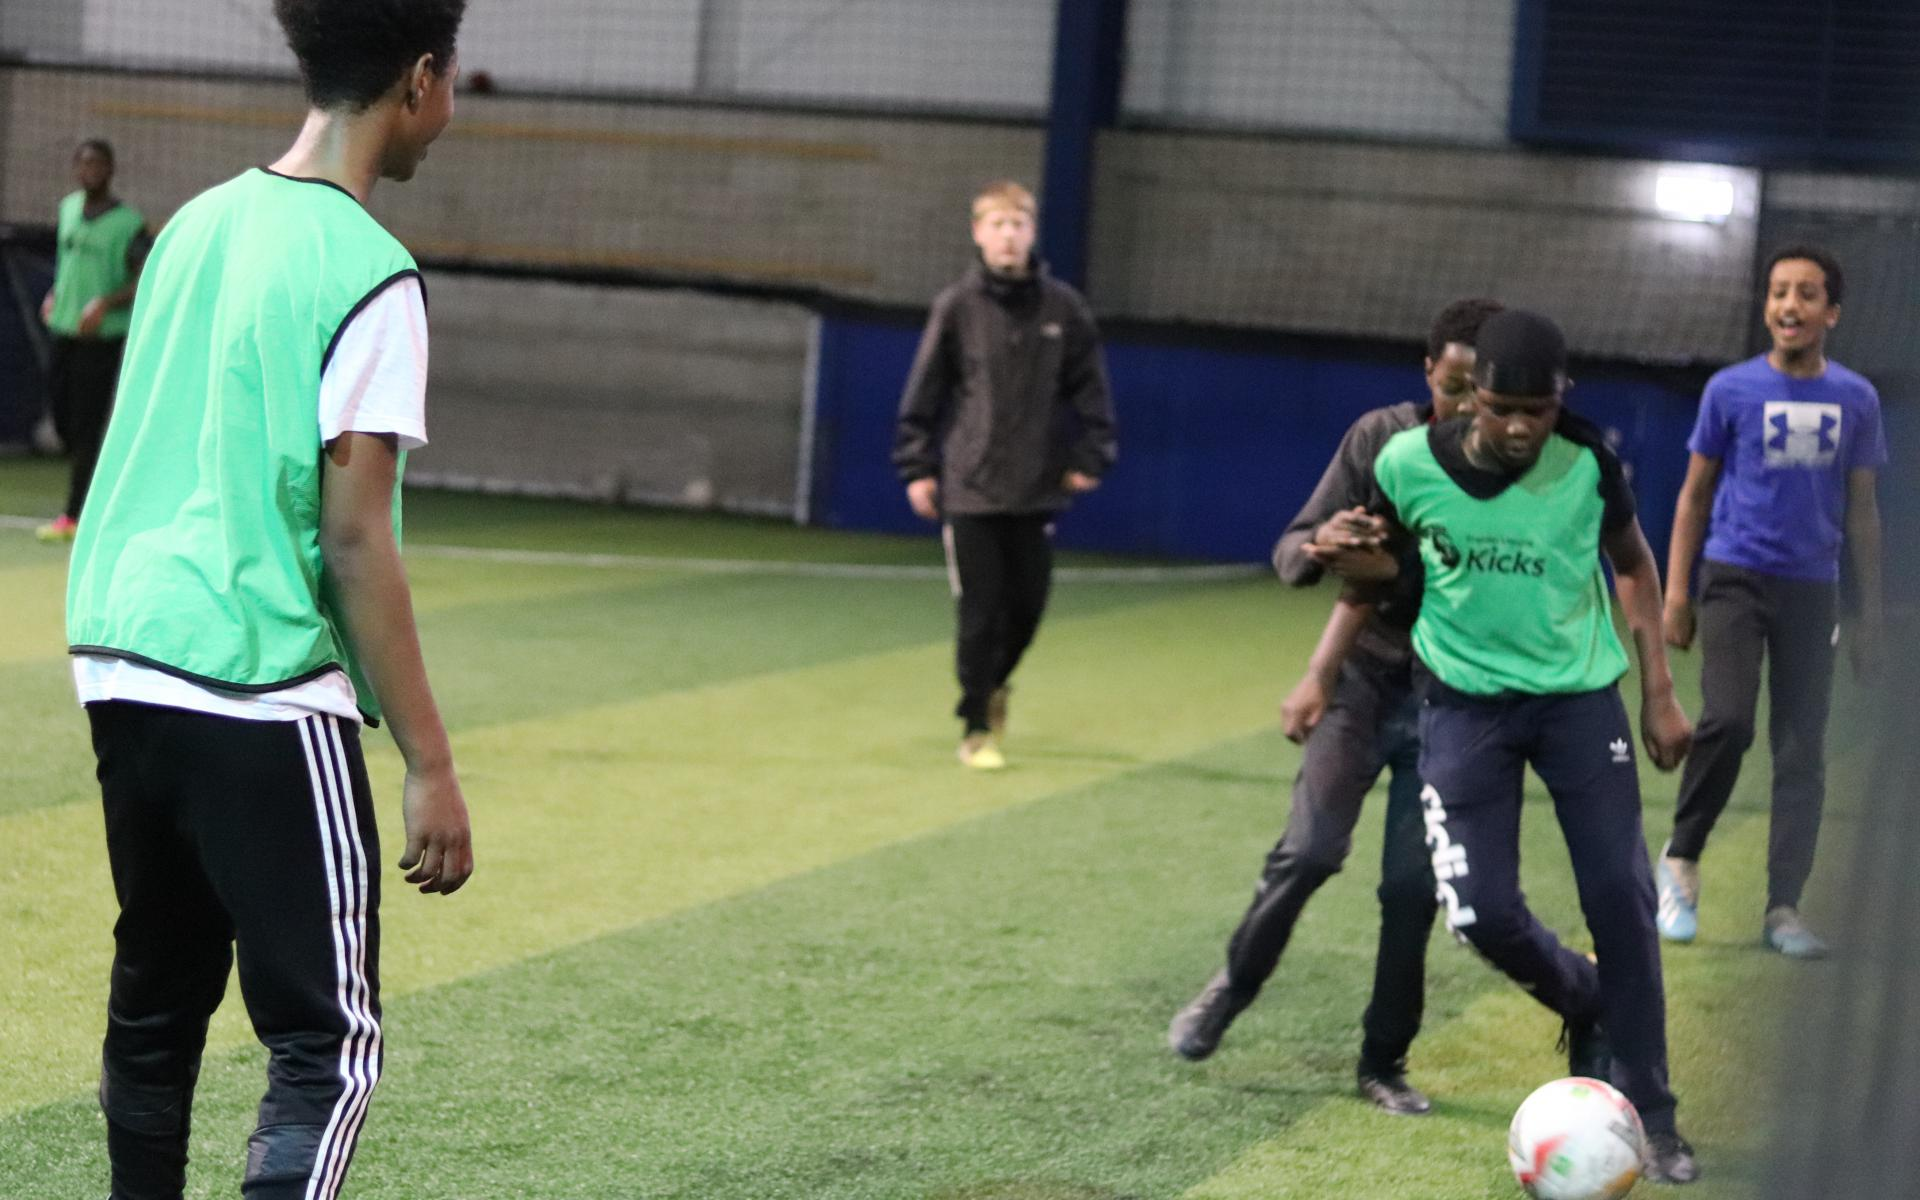 Participants enjoy a Football session